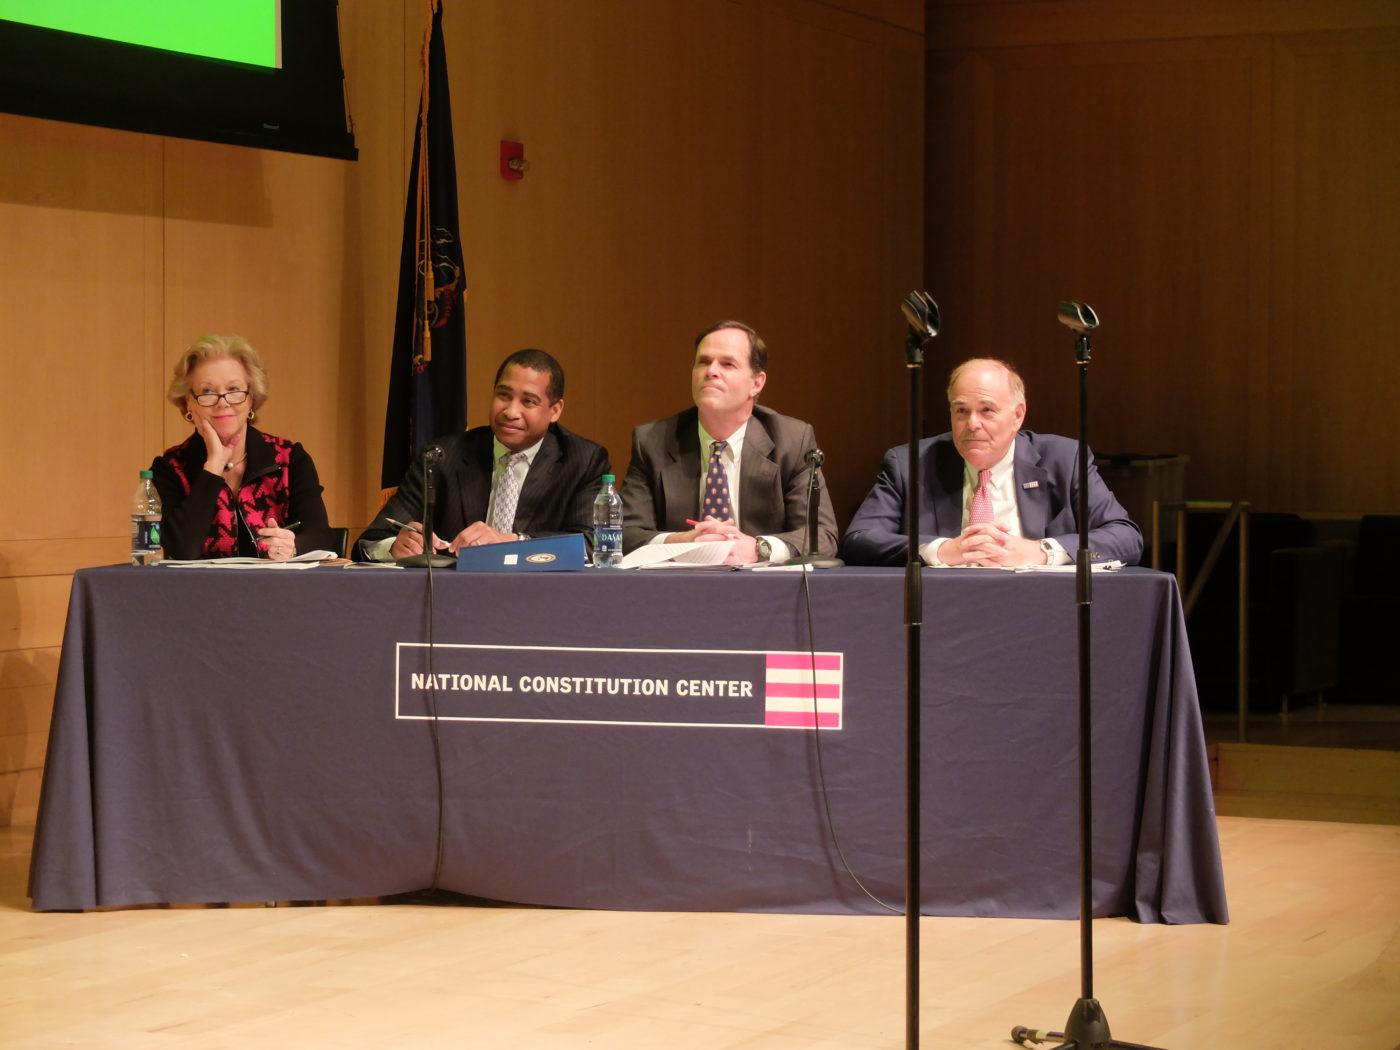 Panel of judges for the 2015 Lenfest Citizenship Challenge.